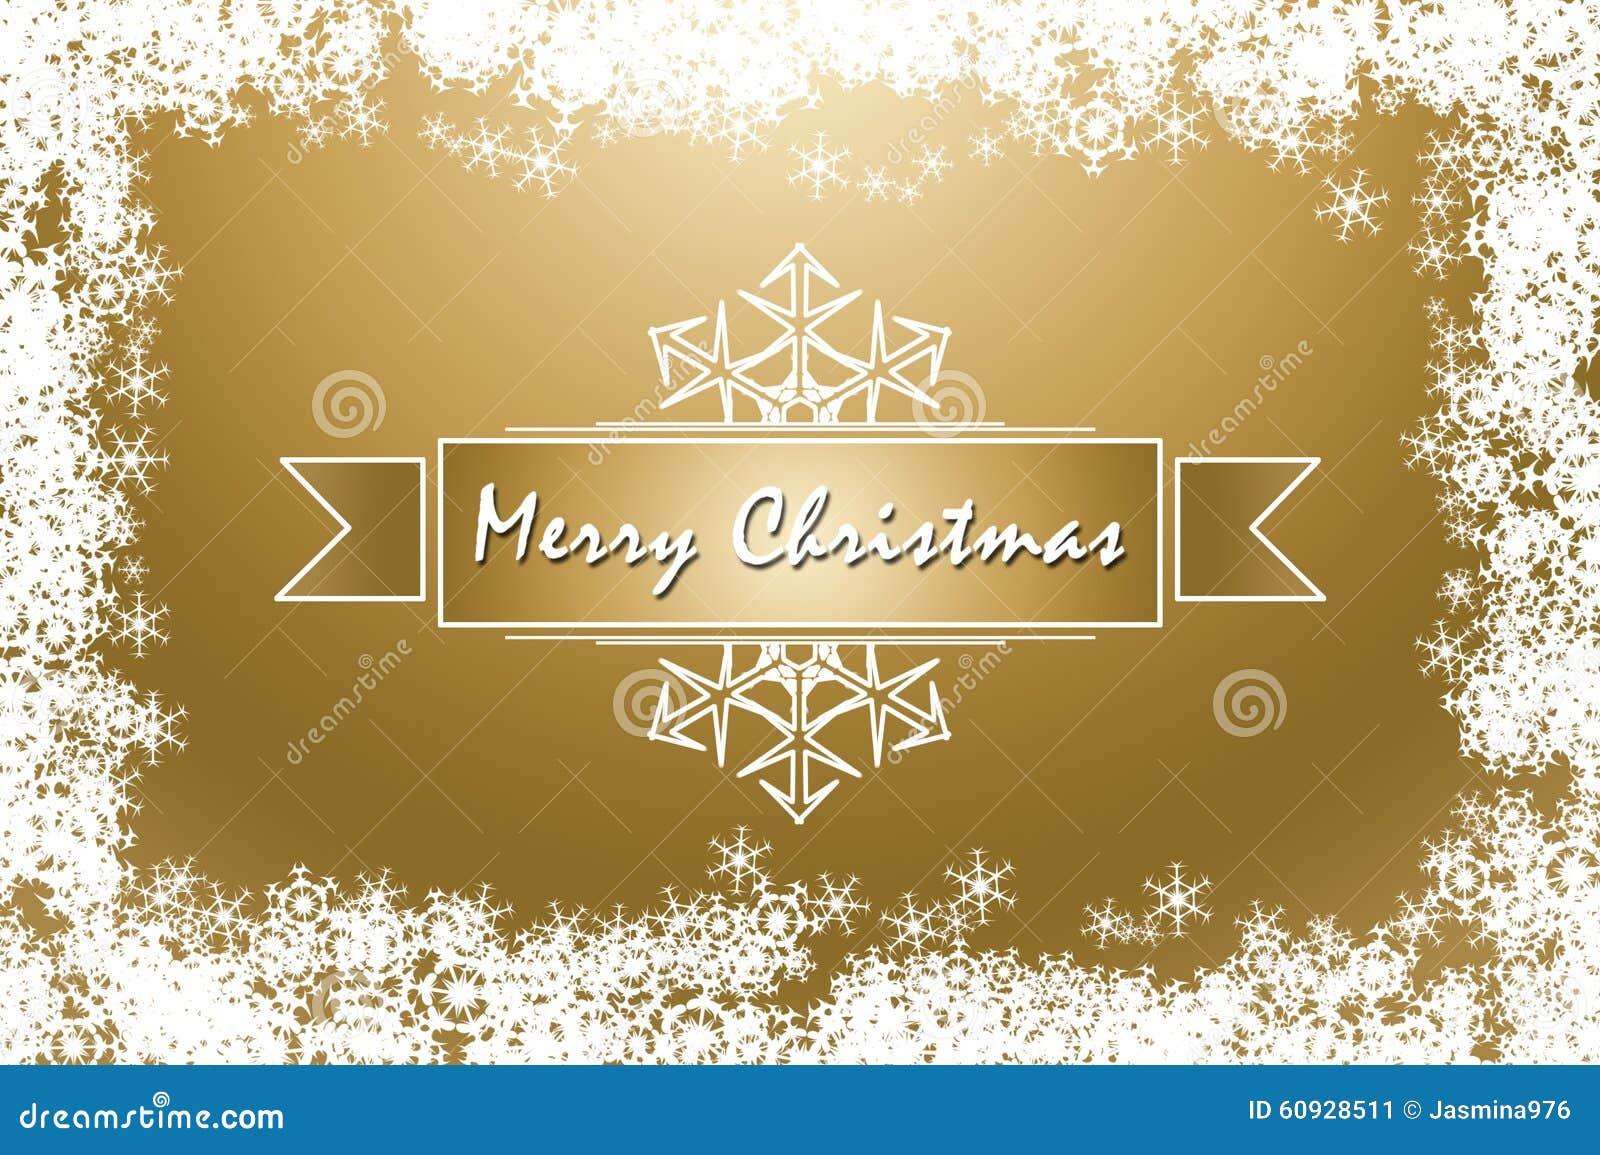 Auguri Di Buon Natale Eleganti.Cartolina D Auguri Dorata Elegante Di Buon Natale Illustrazione Di